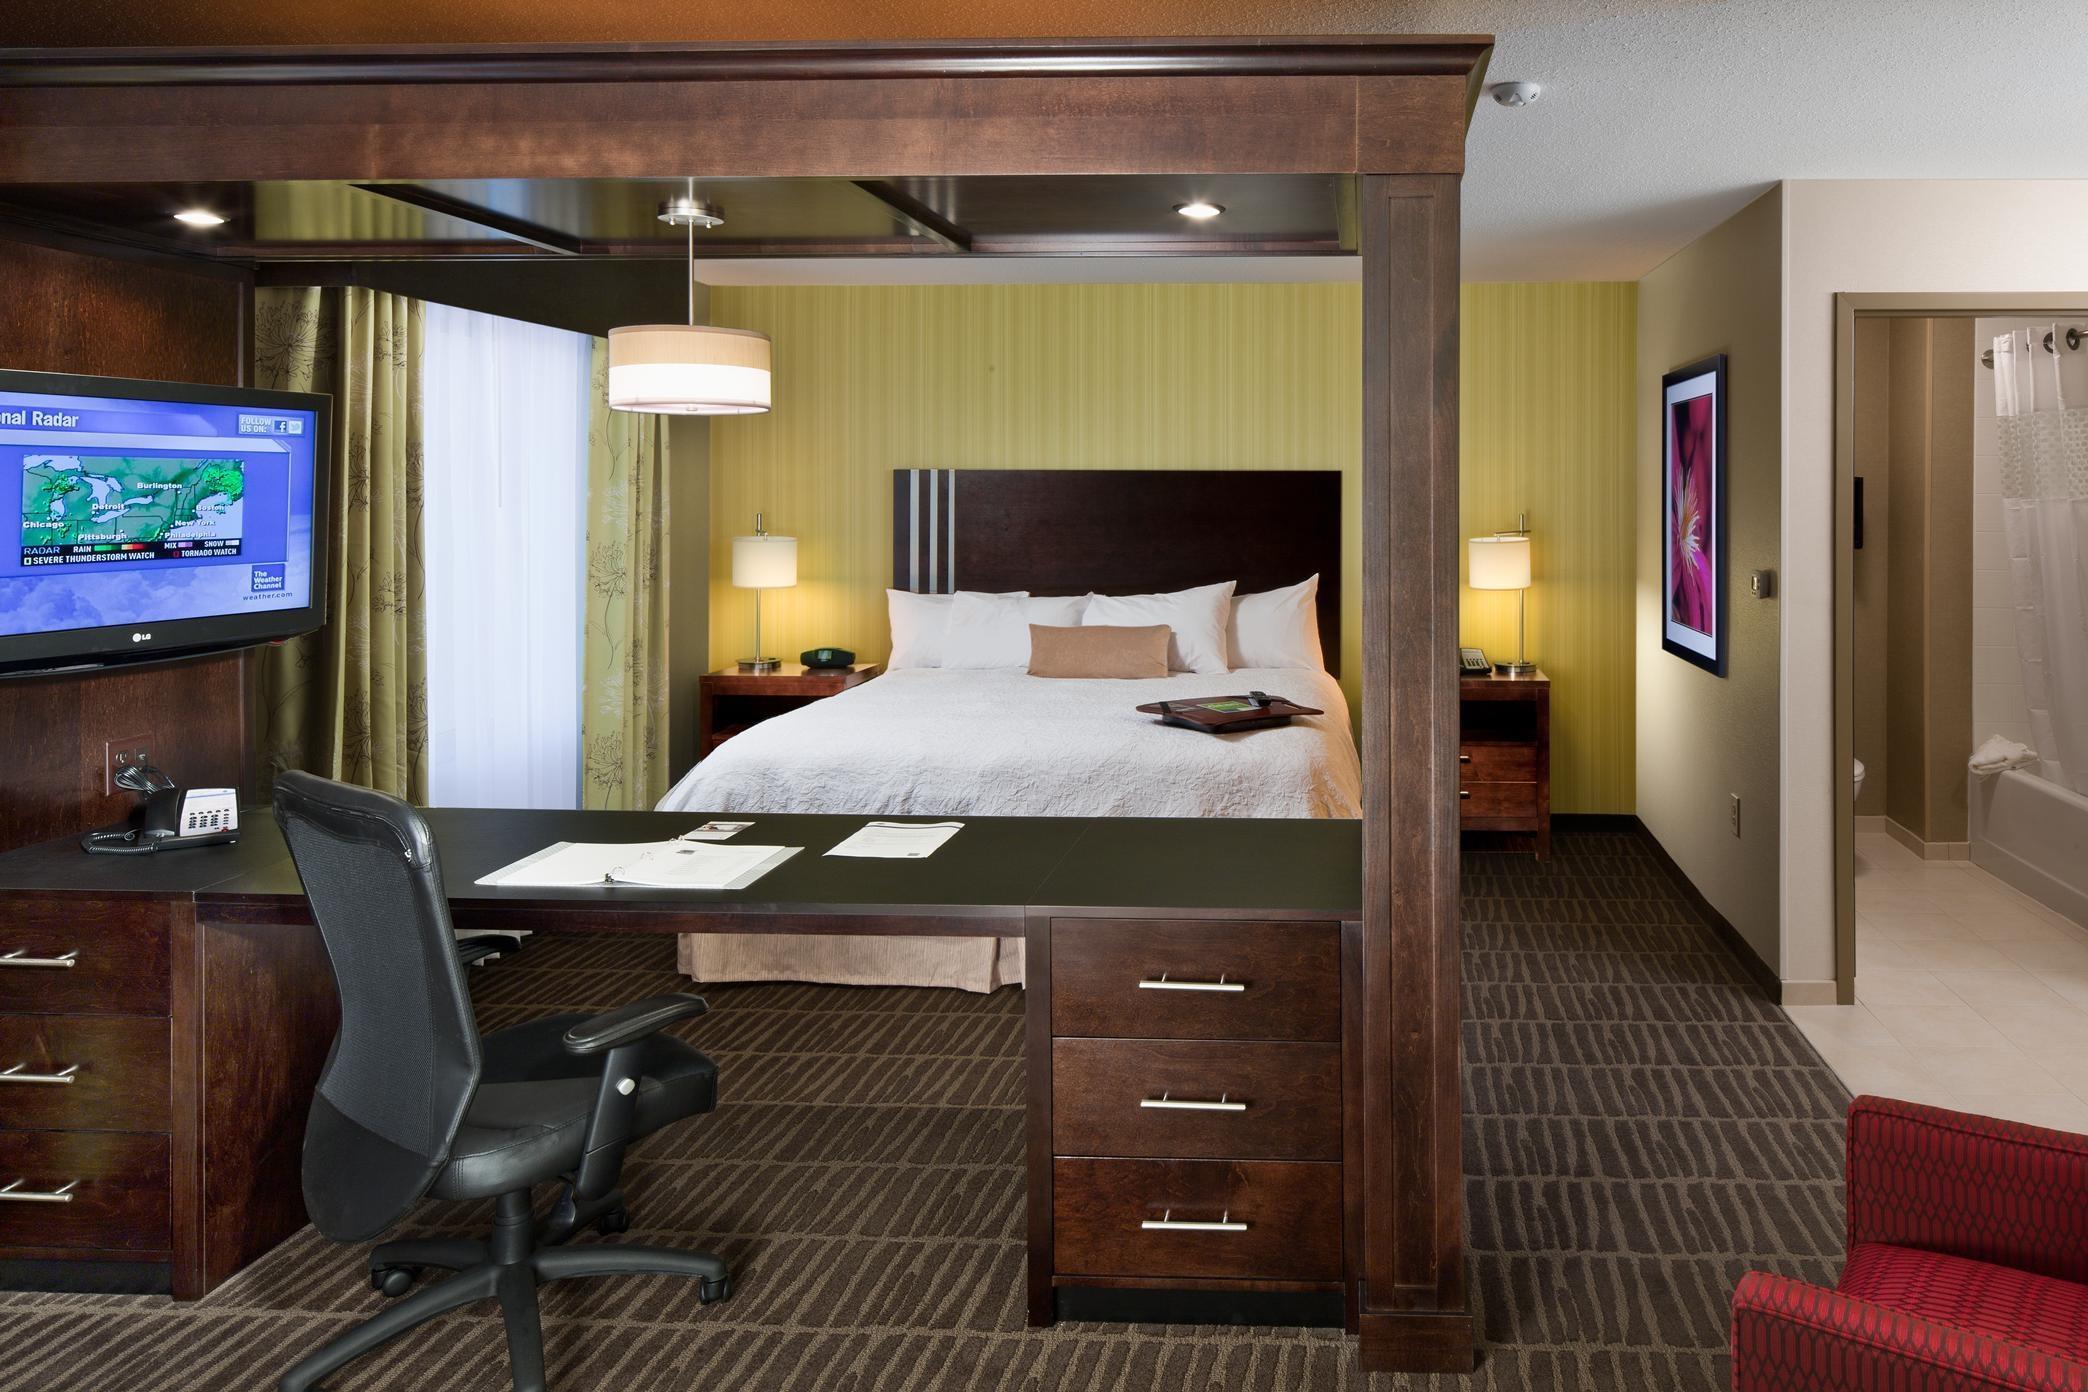 Hampton Inn & Suites Saginaw image 14